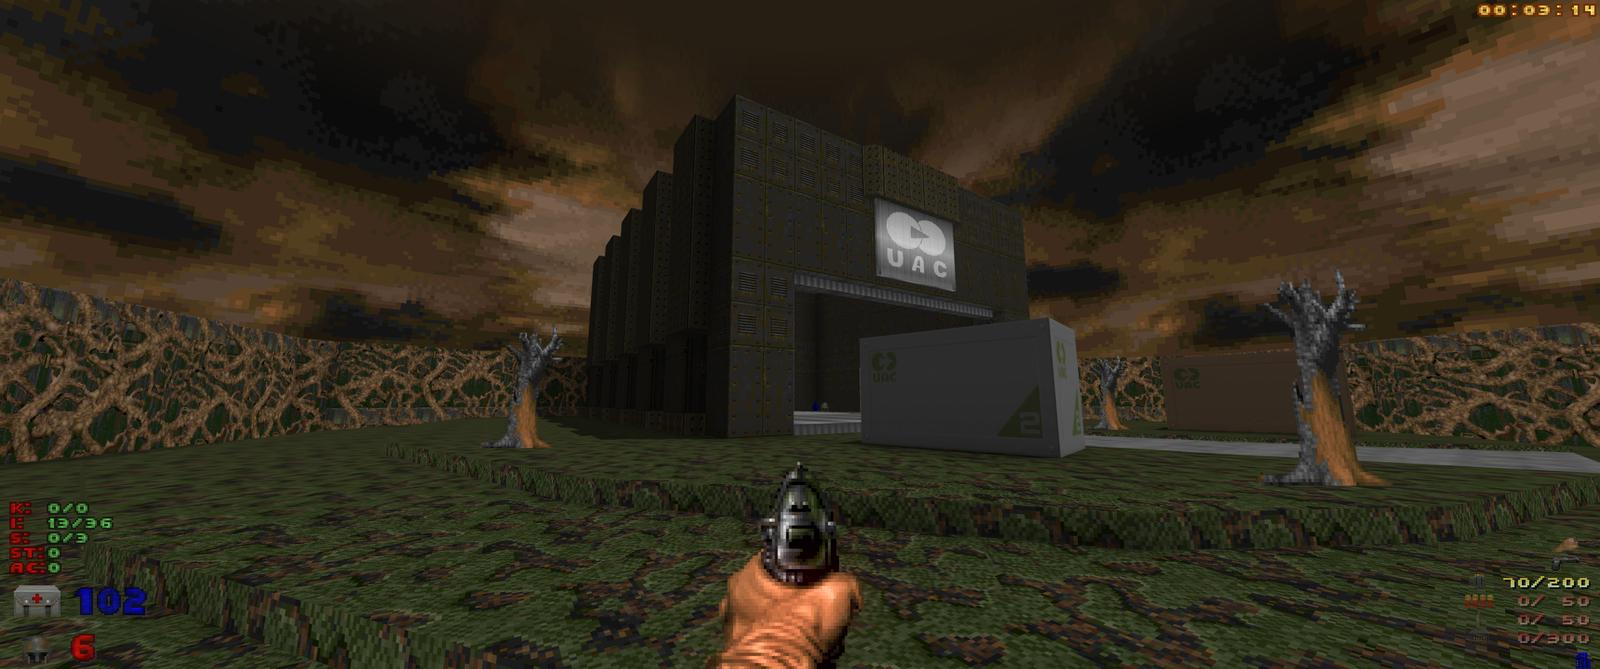 Screenshot_Doom_20180314_184510.png.b9d48dba727ded74951dc4bb70f52dc2.png